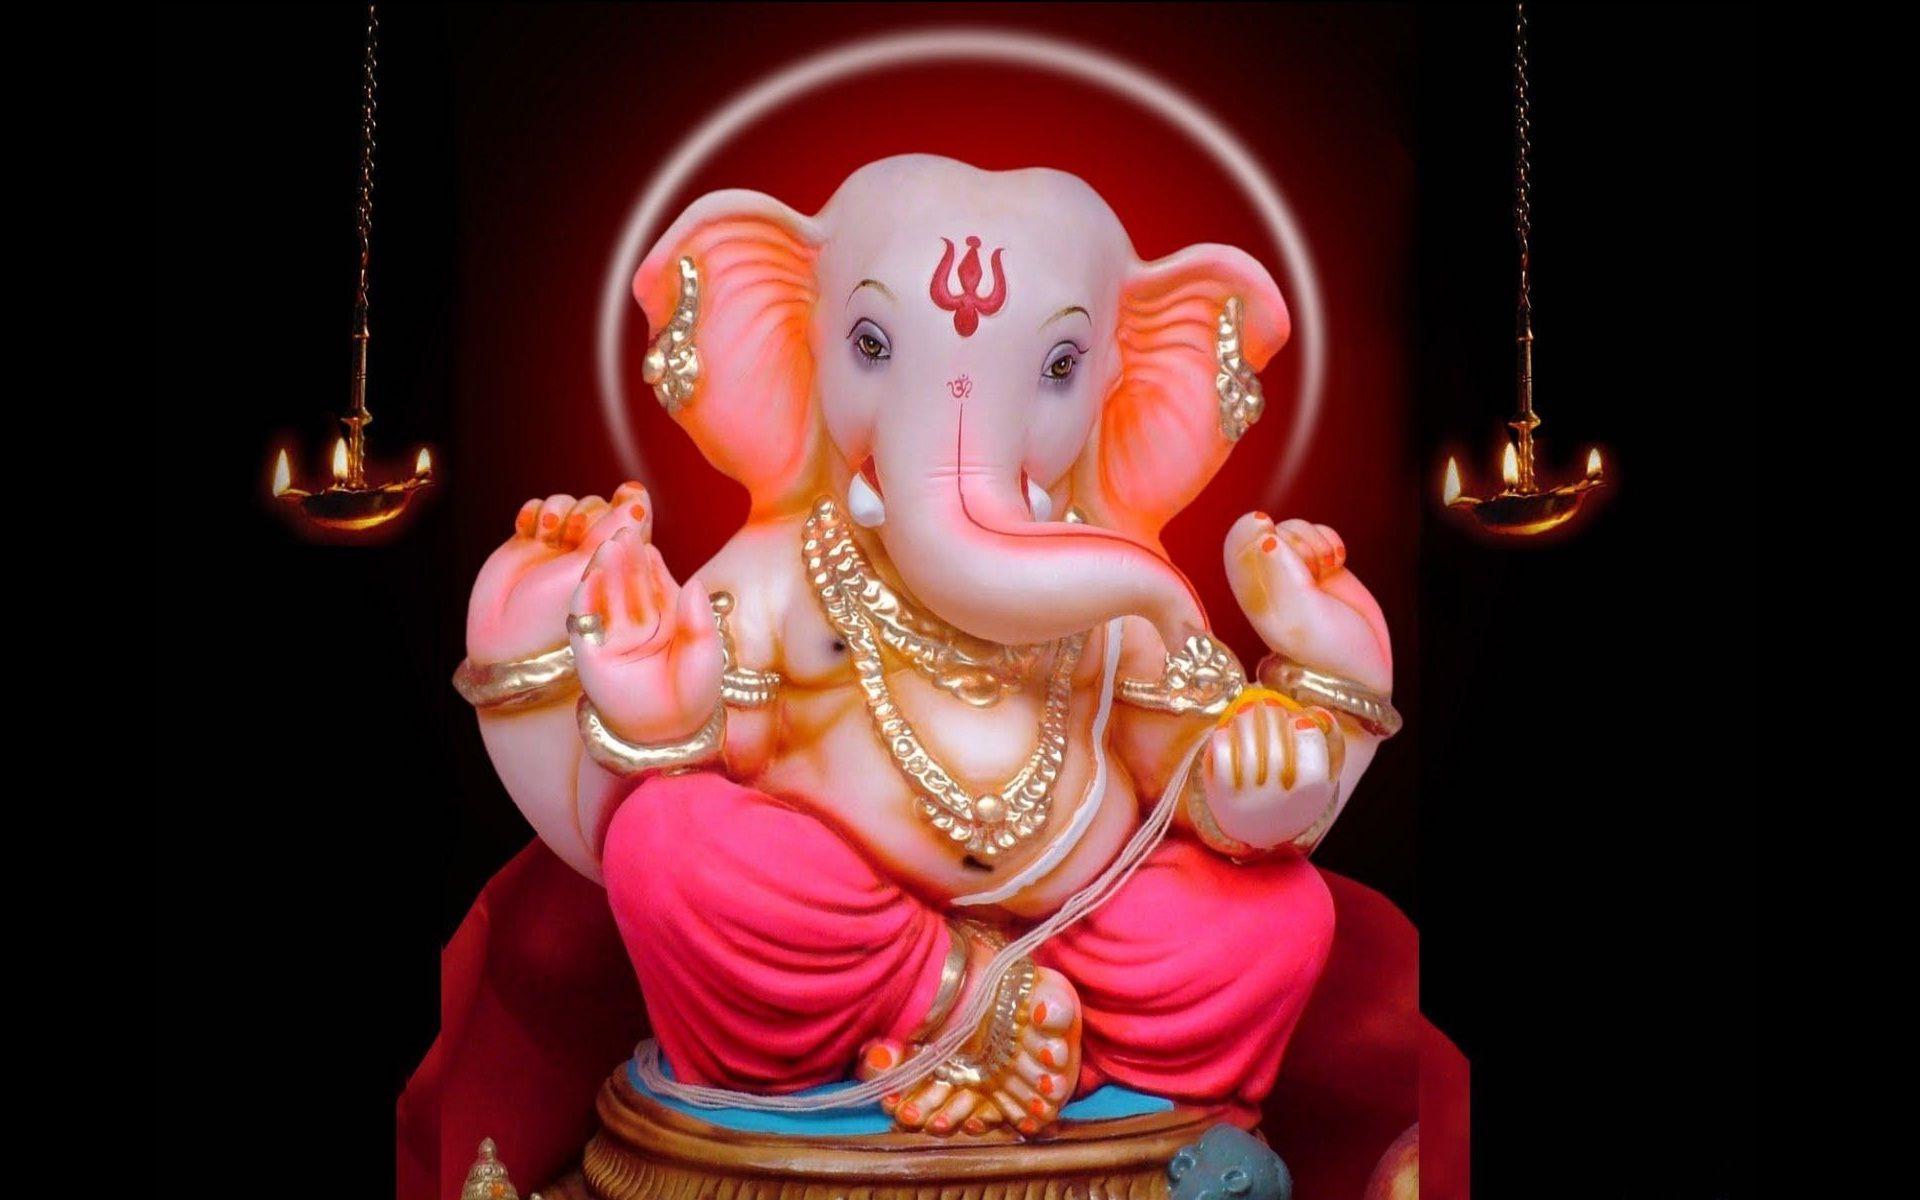 Hd wallpaper ganesh - Lord Ganesh High Quality Wide Hd Wallpaper Hd Wallpapers Rocks